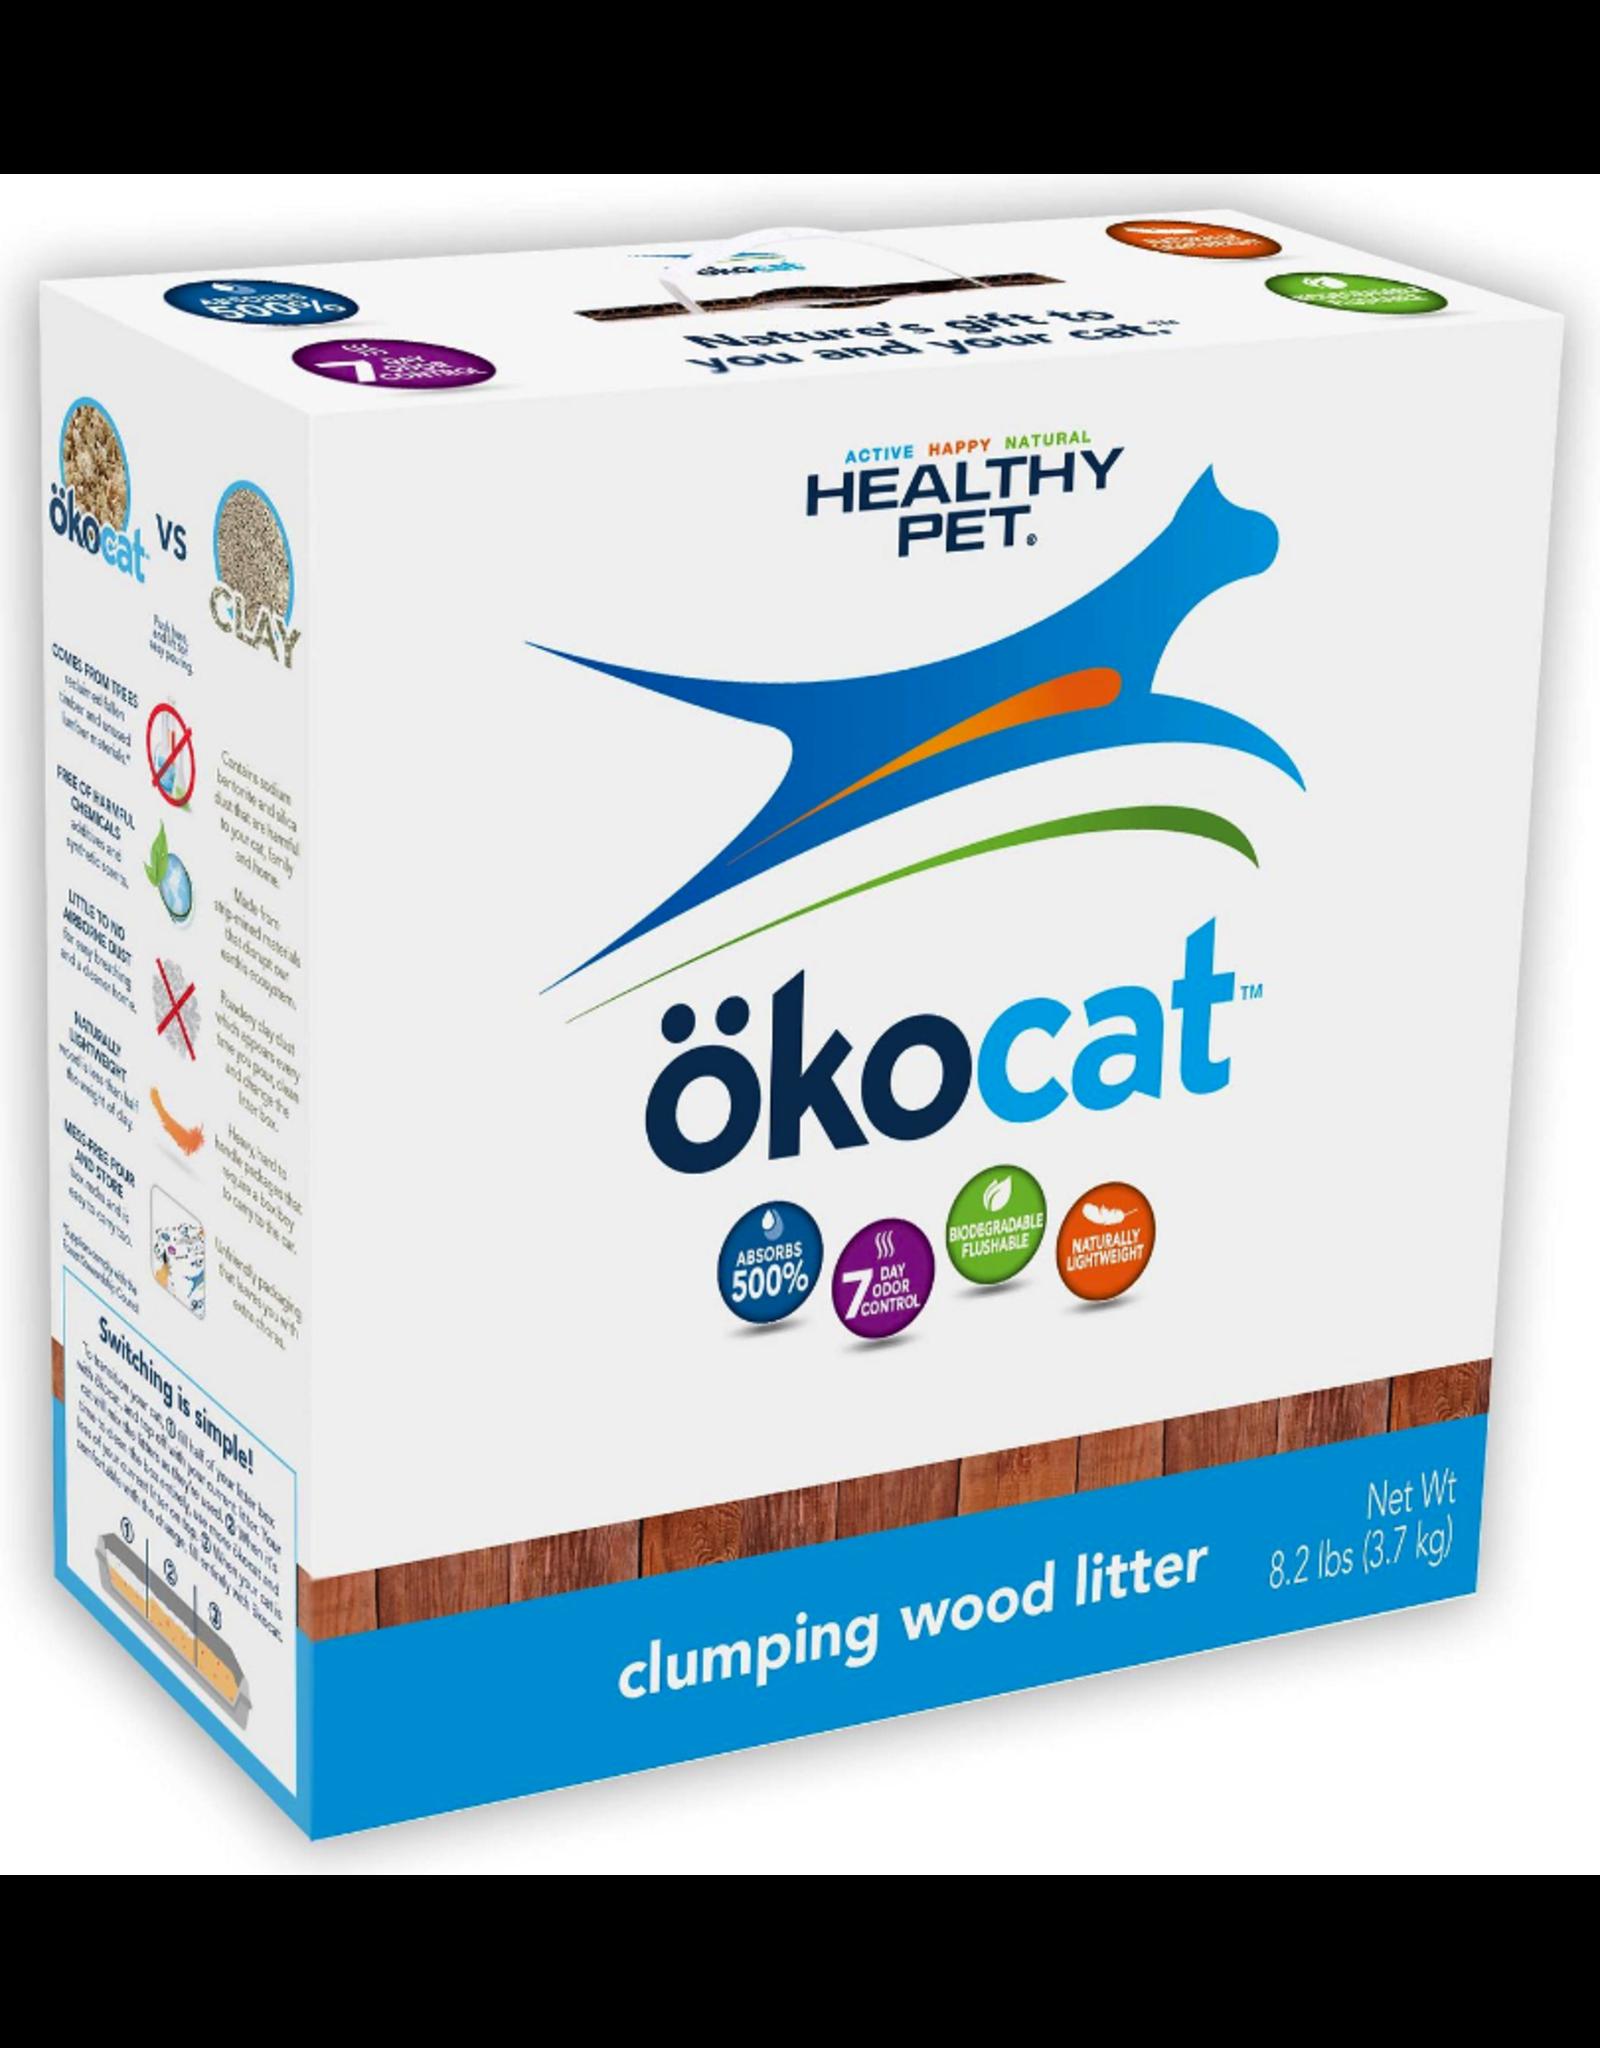 Healthy Pet Healthy Pet okocat Clumping Wood Litter